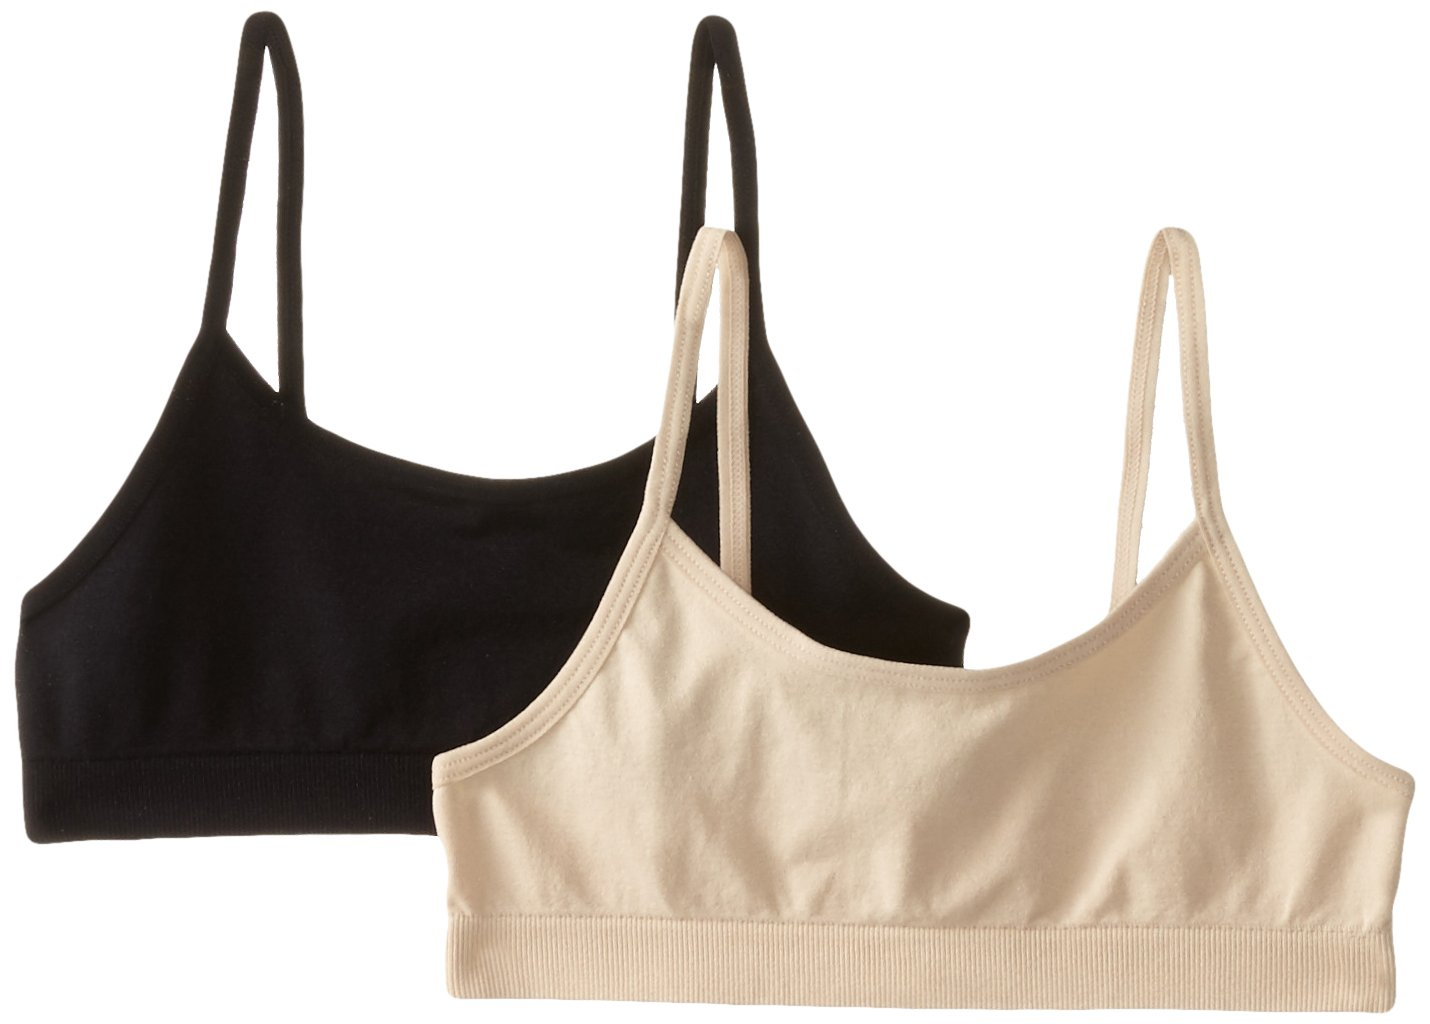 Trimfit Girls Big Seamless Crop Top (Pack of 2) trimfit Girls 7-16 98000